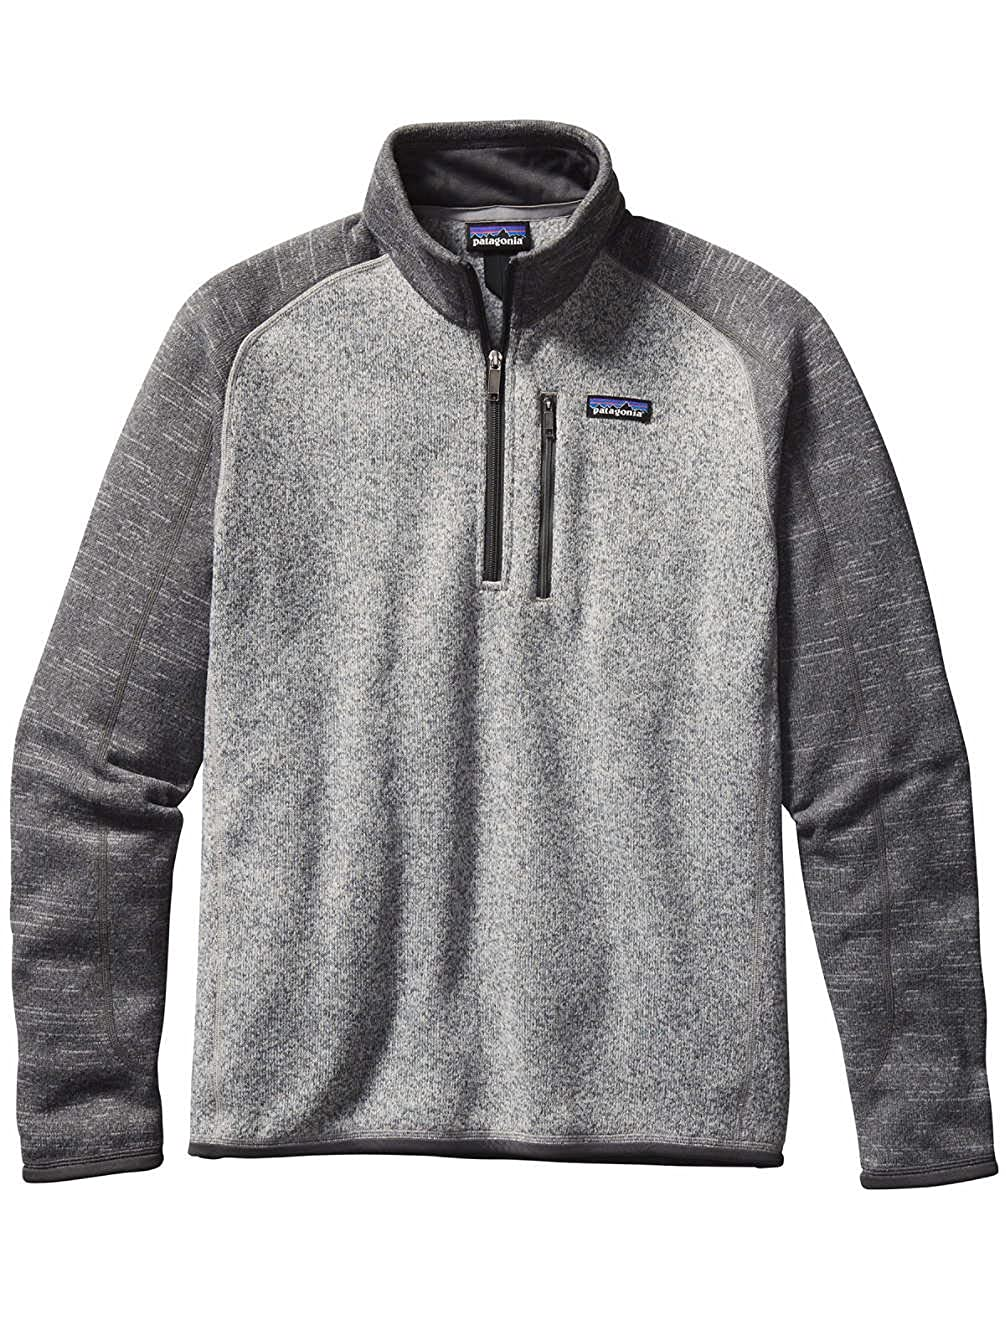 52be3a794 Patagonia Better Sweater 1/4 Zip Fleece Men's Jumper